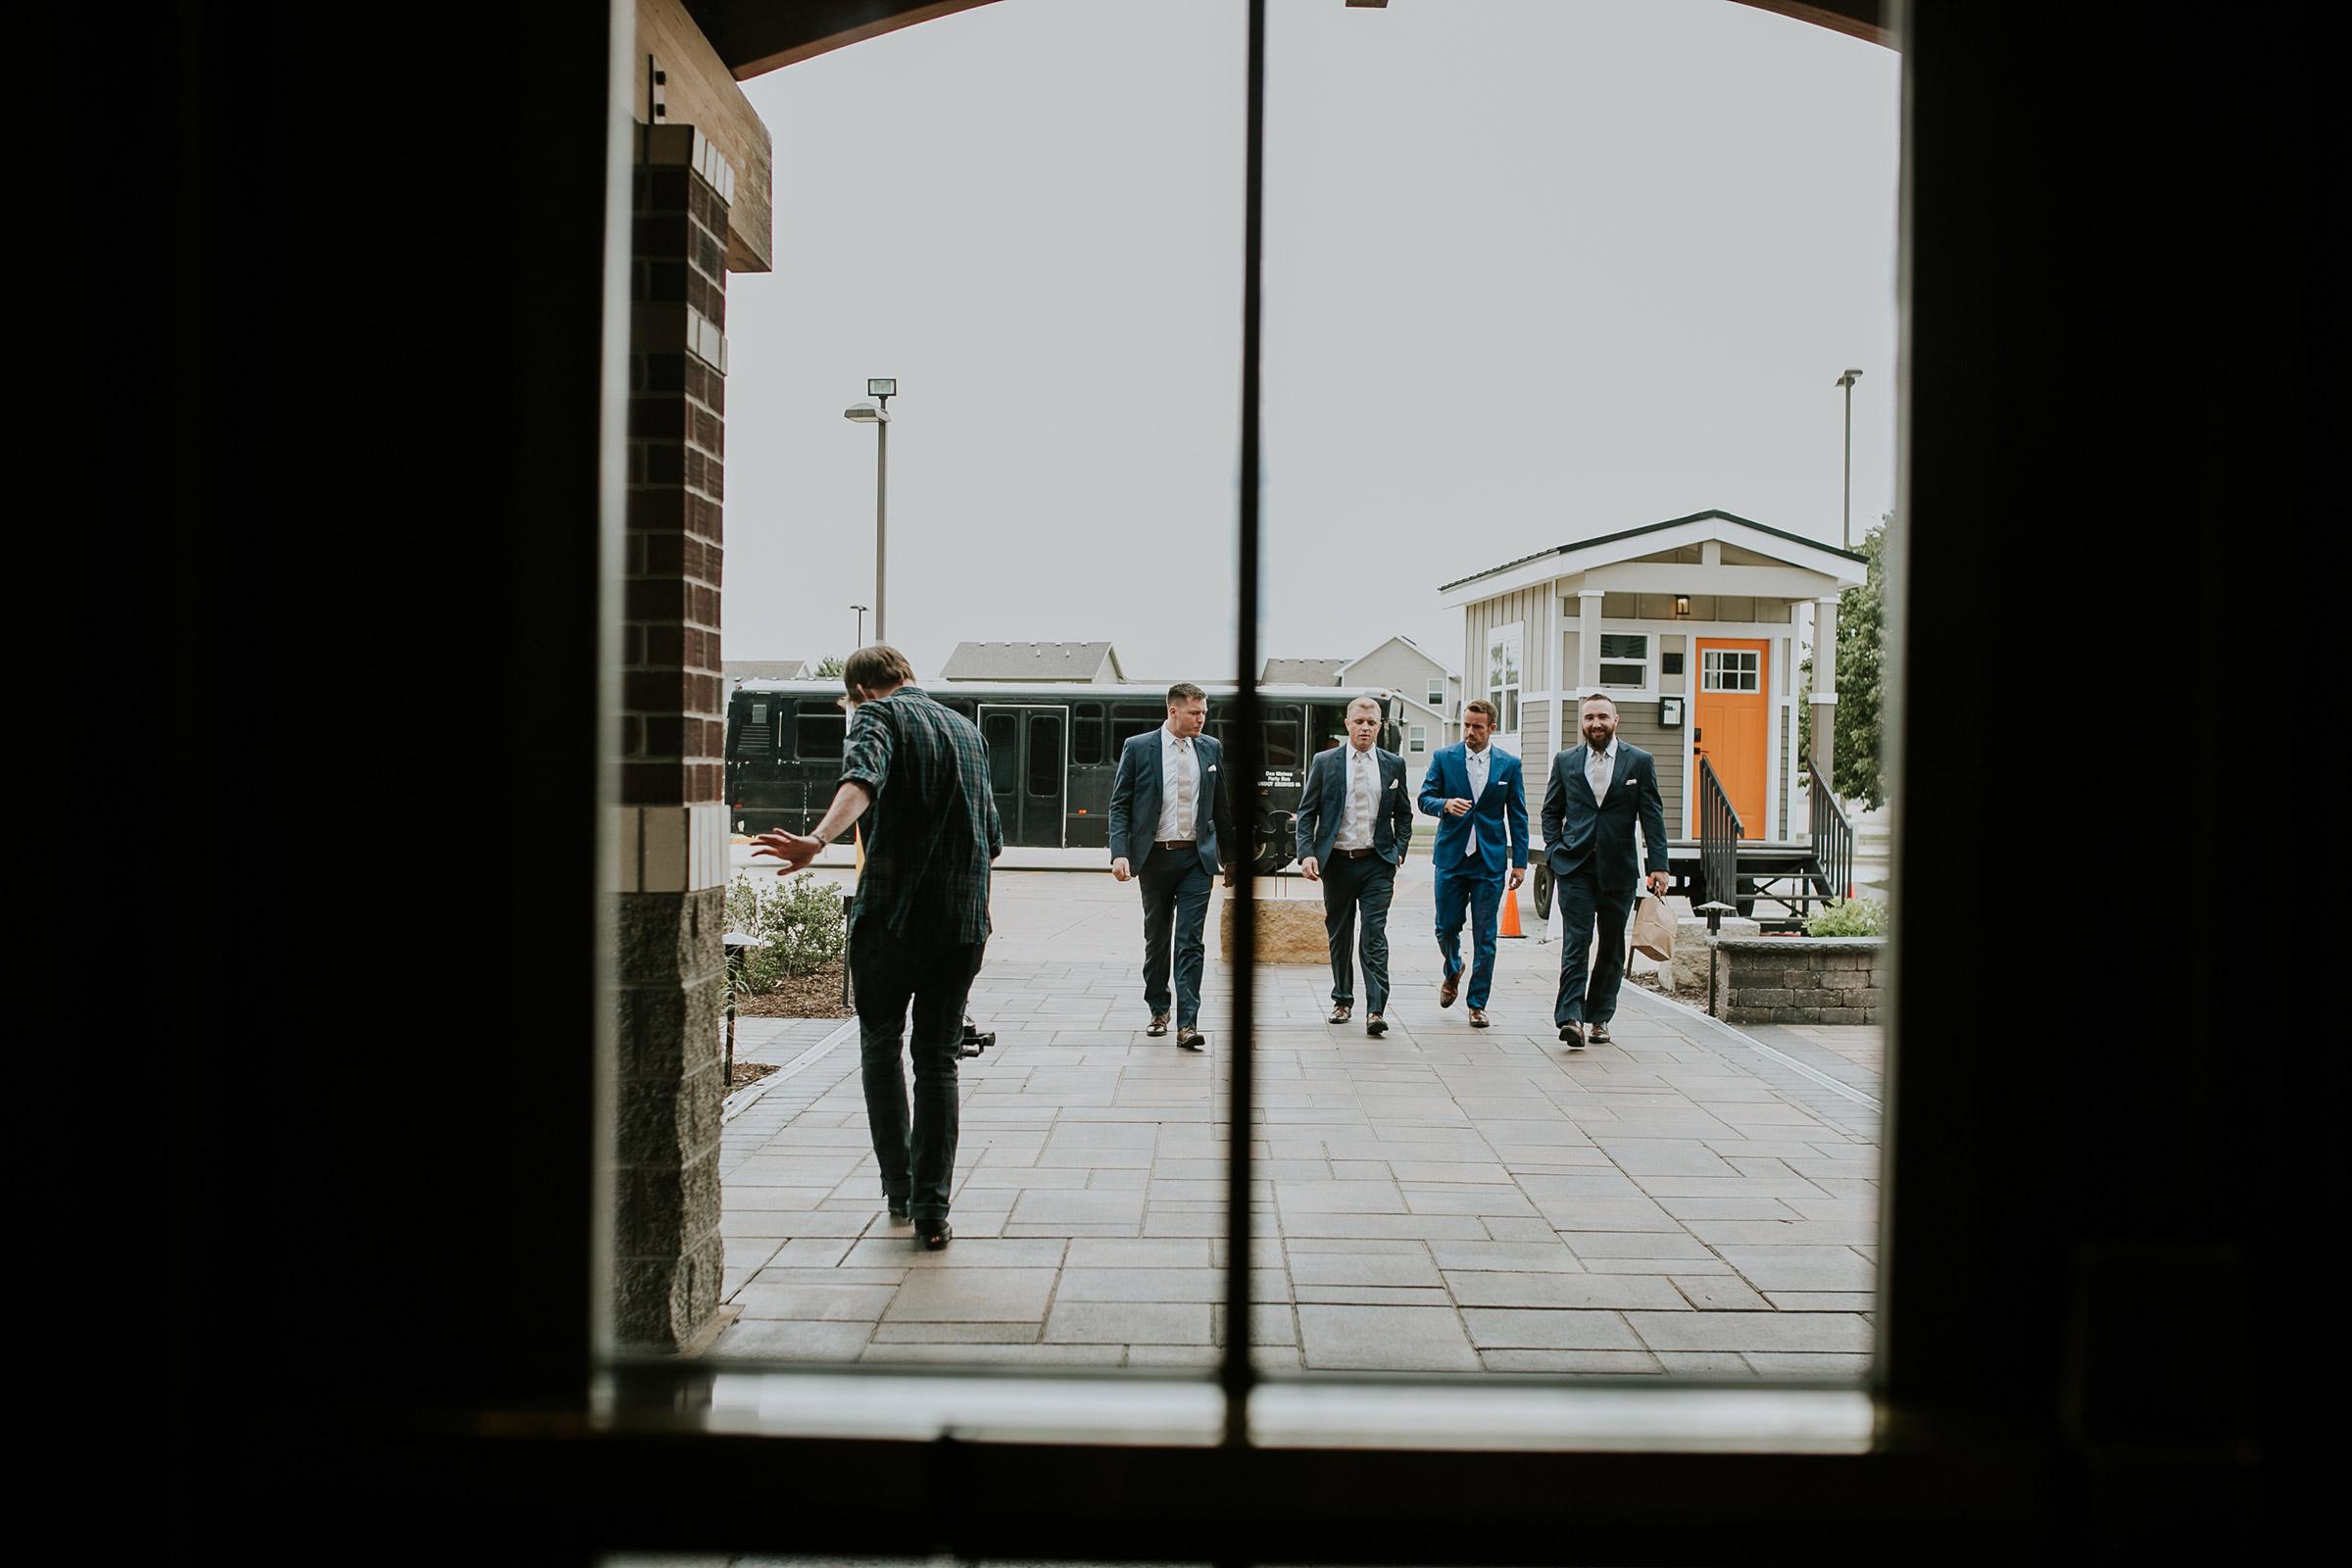 mr-mrs-hull-groom-walking-into-st-boniface-church-waukee-desmoines-iowa-raelyn-ramey-photography-164.jpg